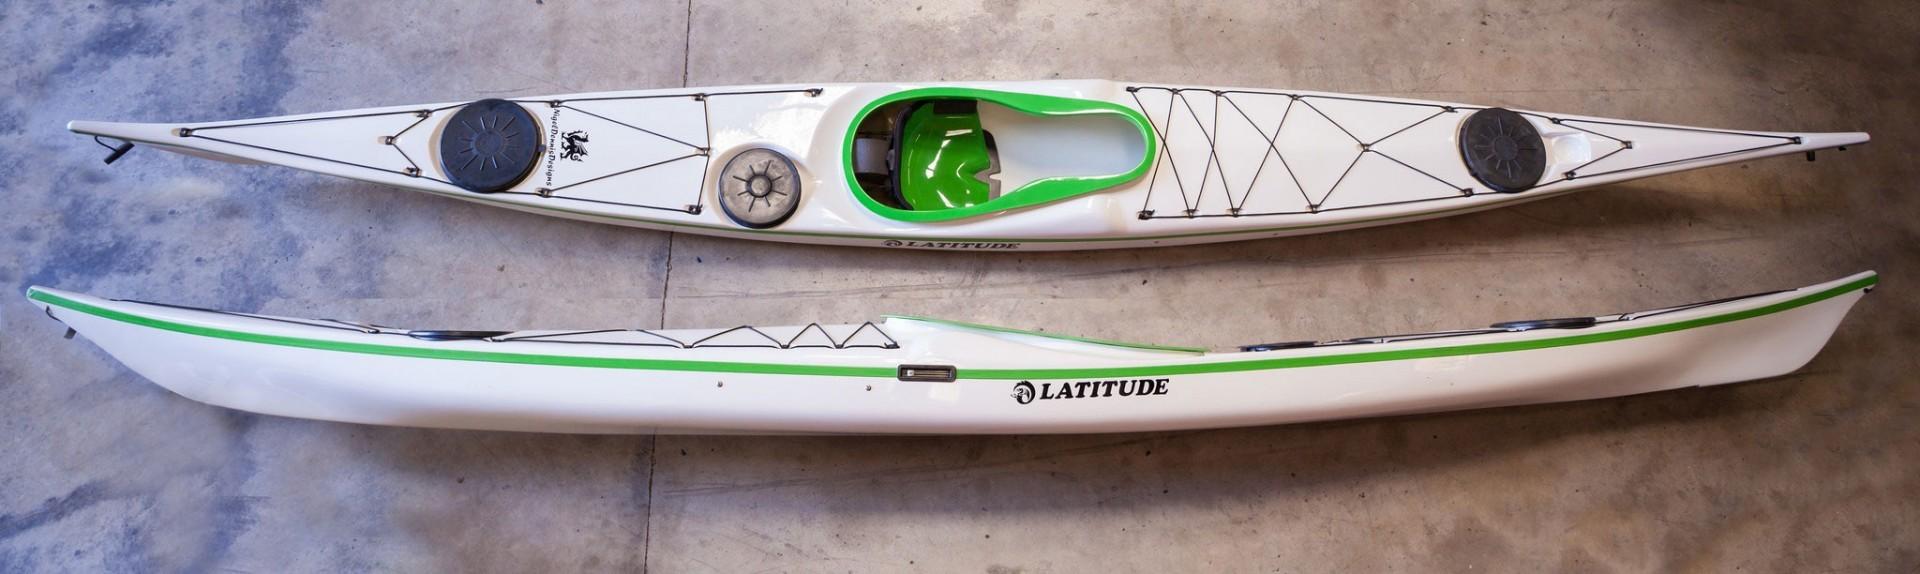 NDK Latitude Sea Kayak top and side views